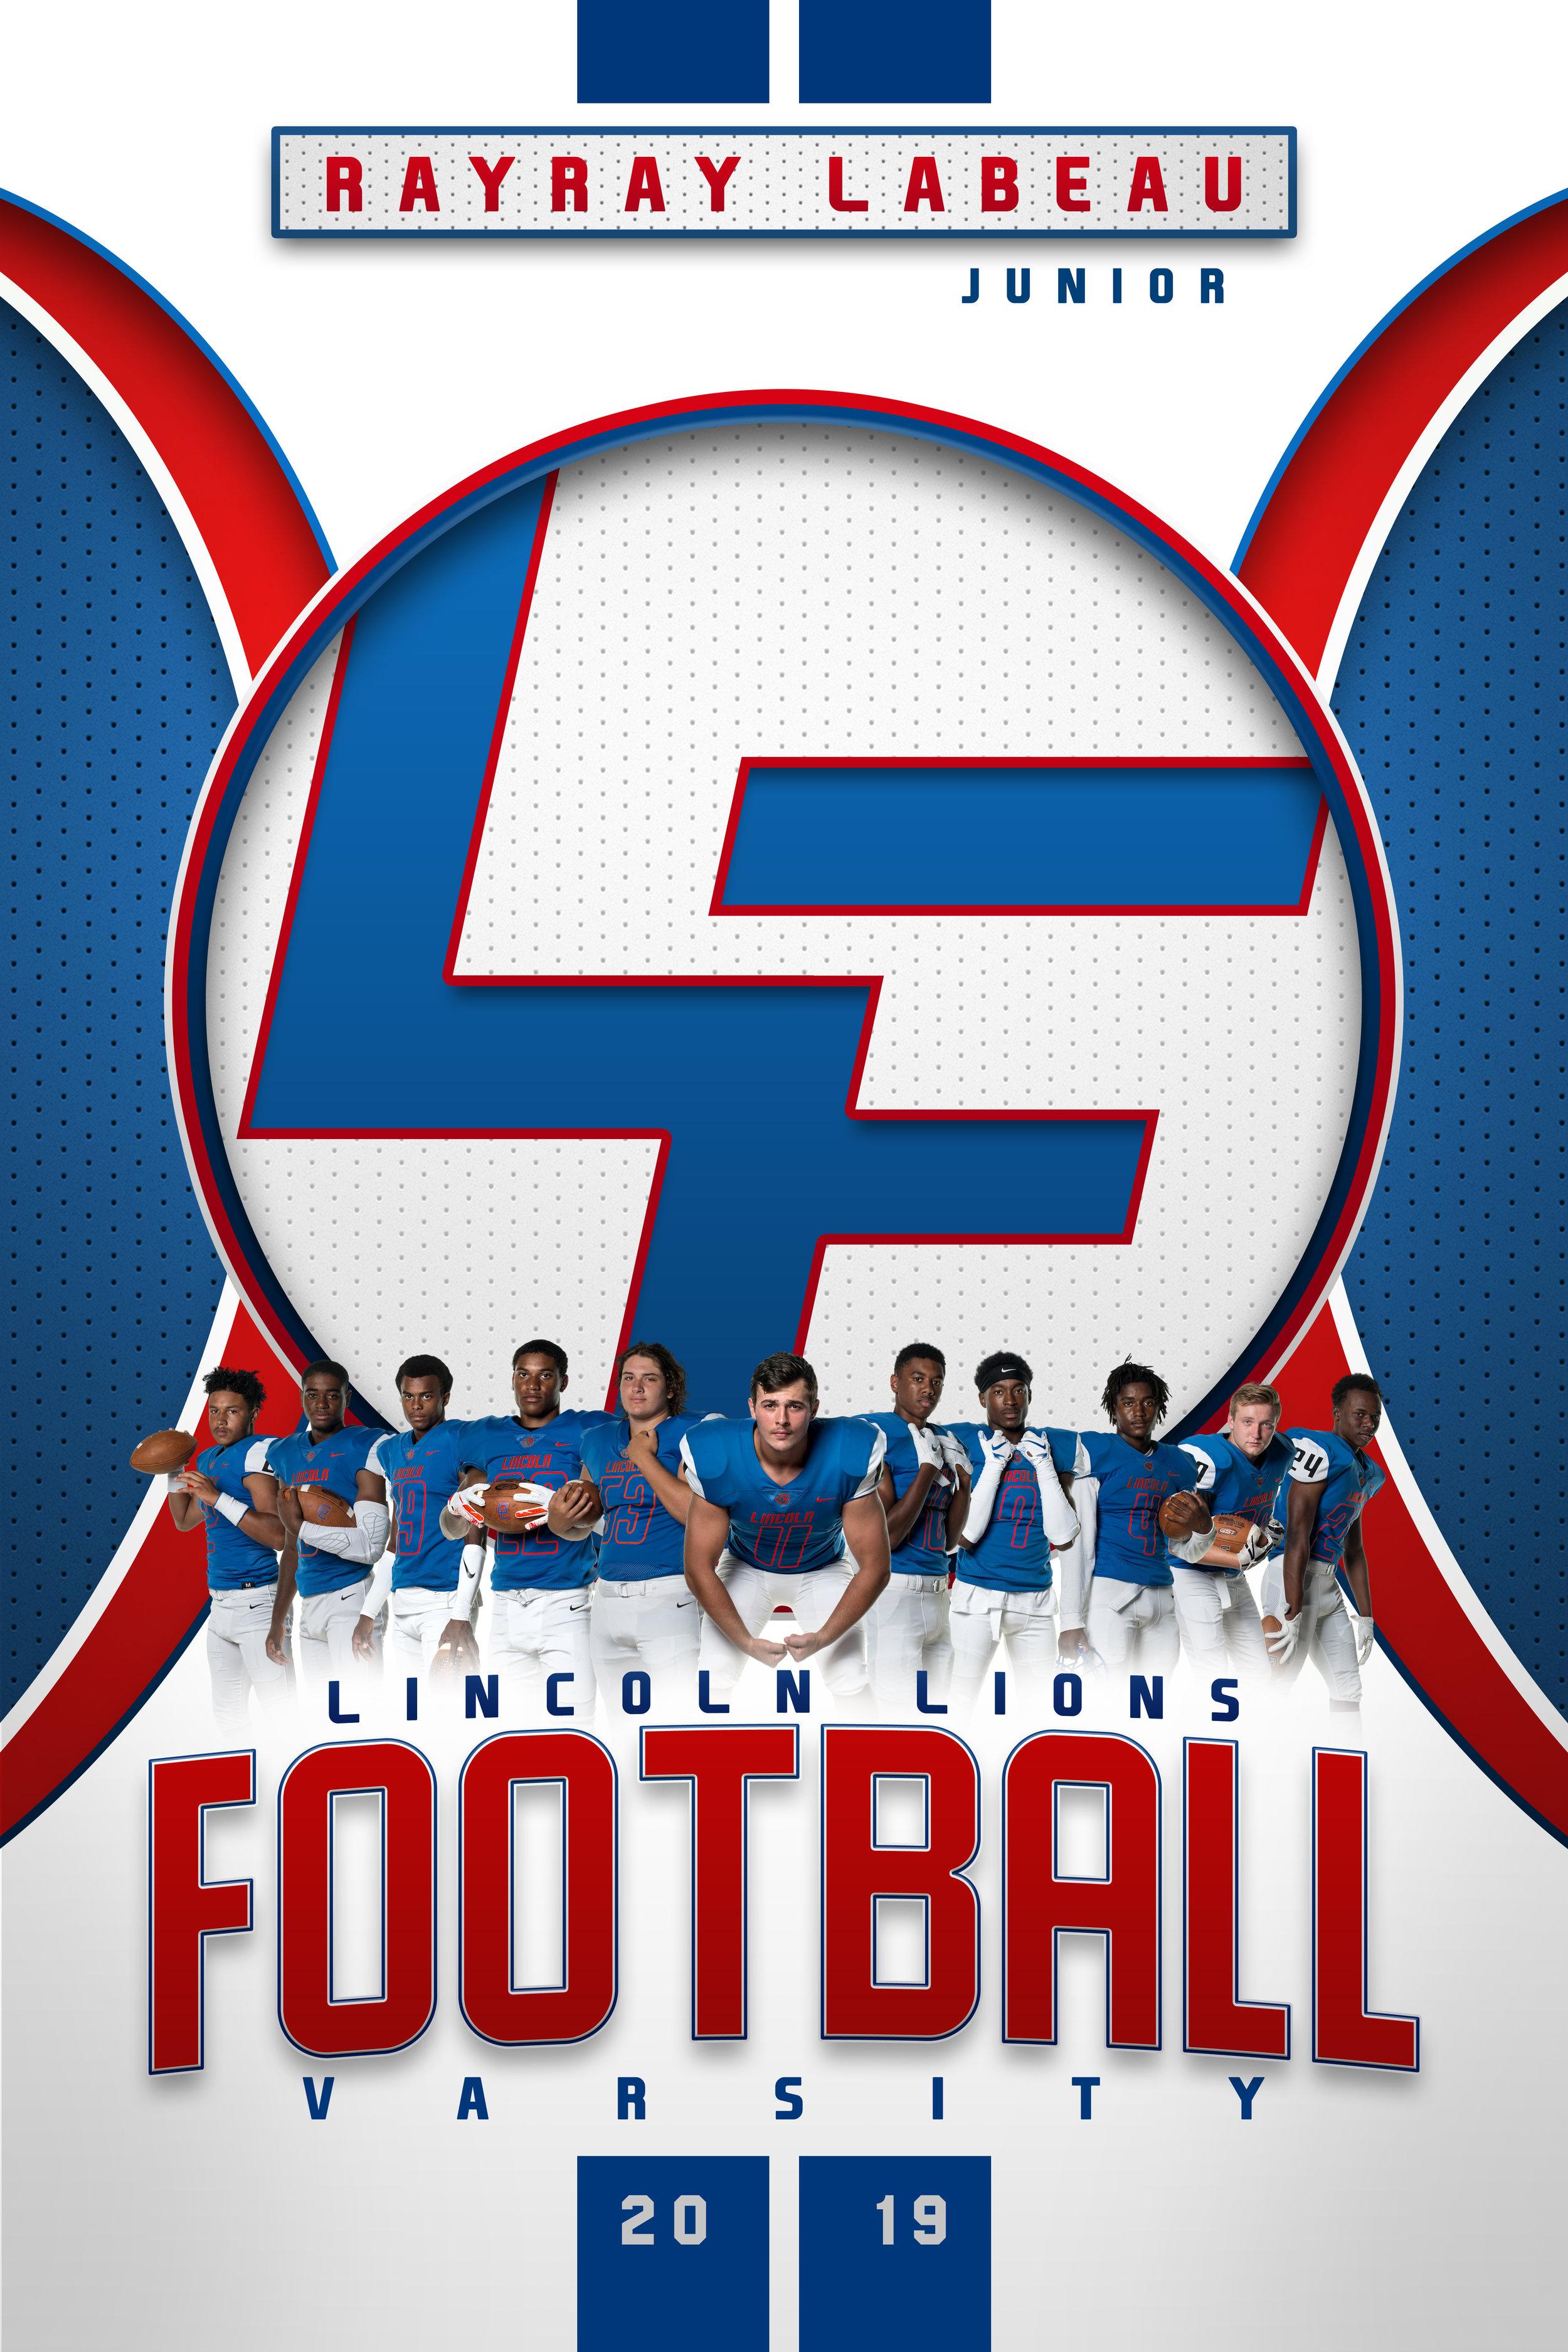 LincolLion_Football_Vertical_16x24_4.jpg